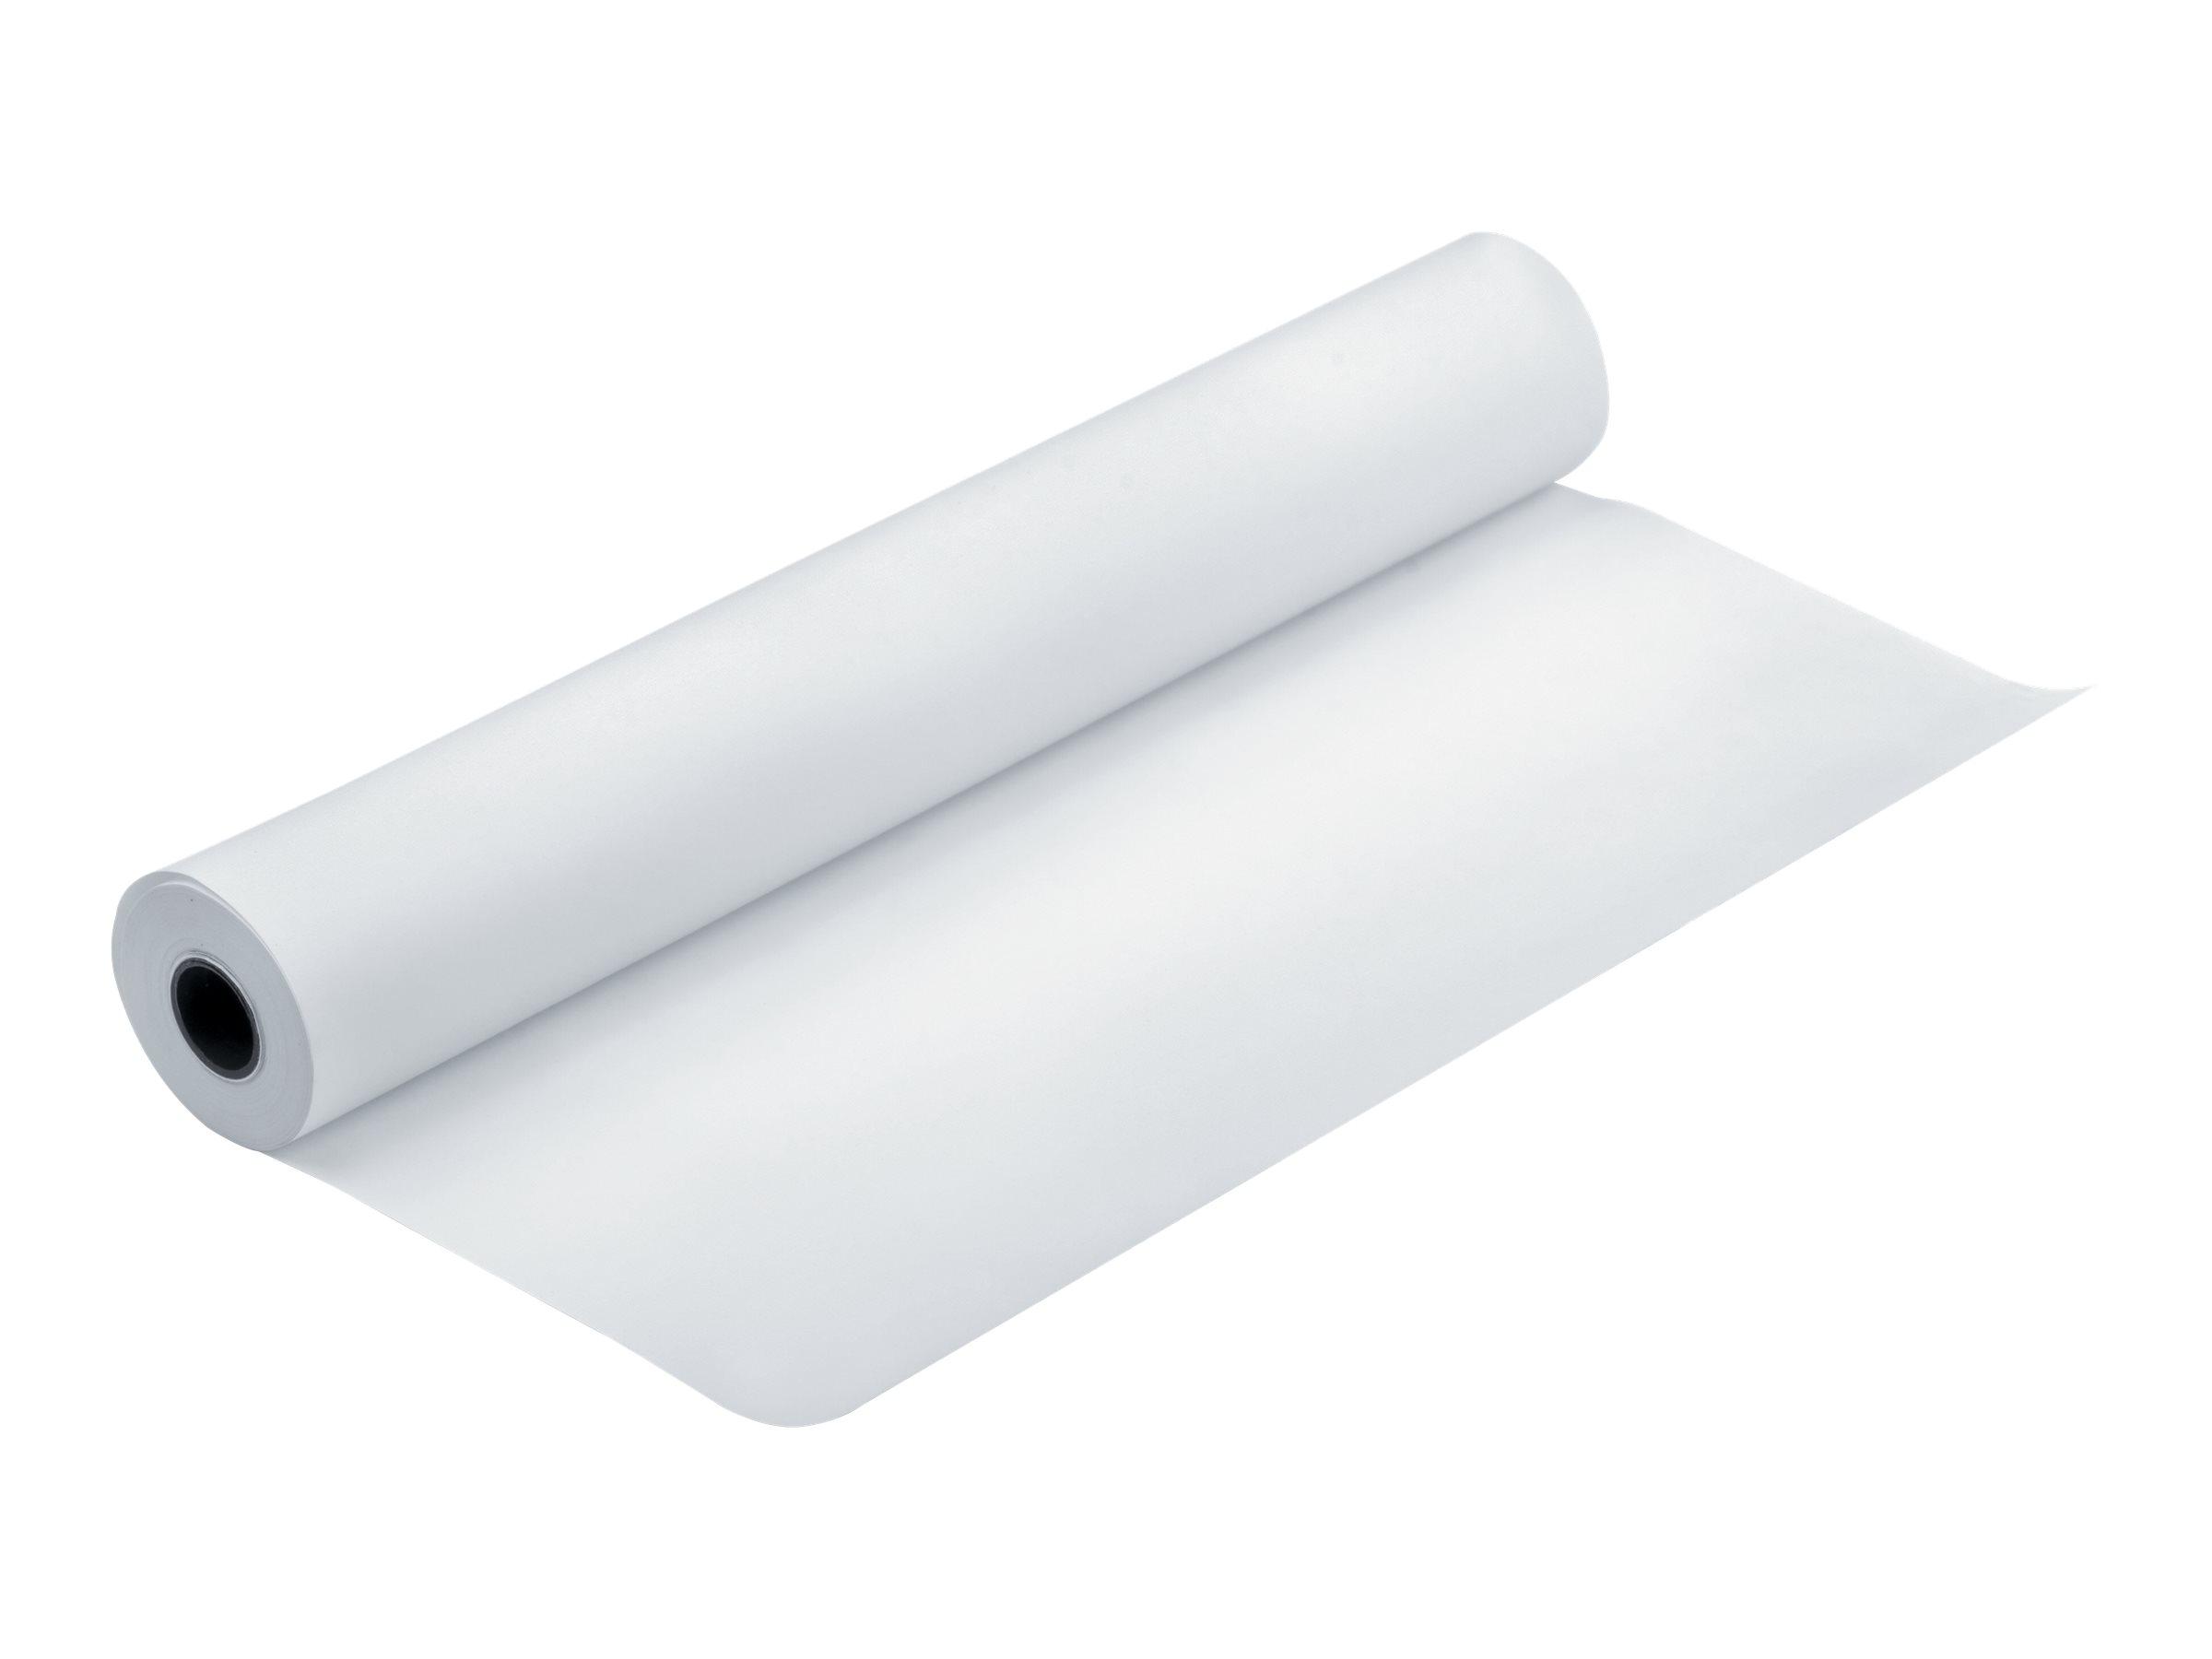 Epson Premium Luster Photo Paper (260) - Glanz - Rolle (111,8 cm x 30,5 m) 1 Rolle(n) Fotopapier - für Stylus Pro 11880, Pro 98X